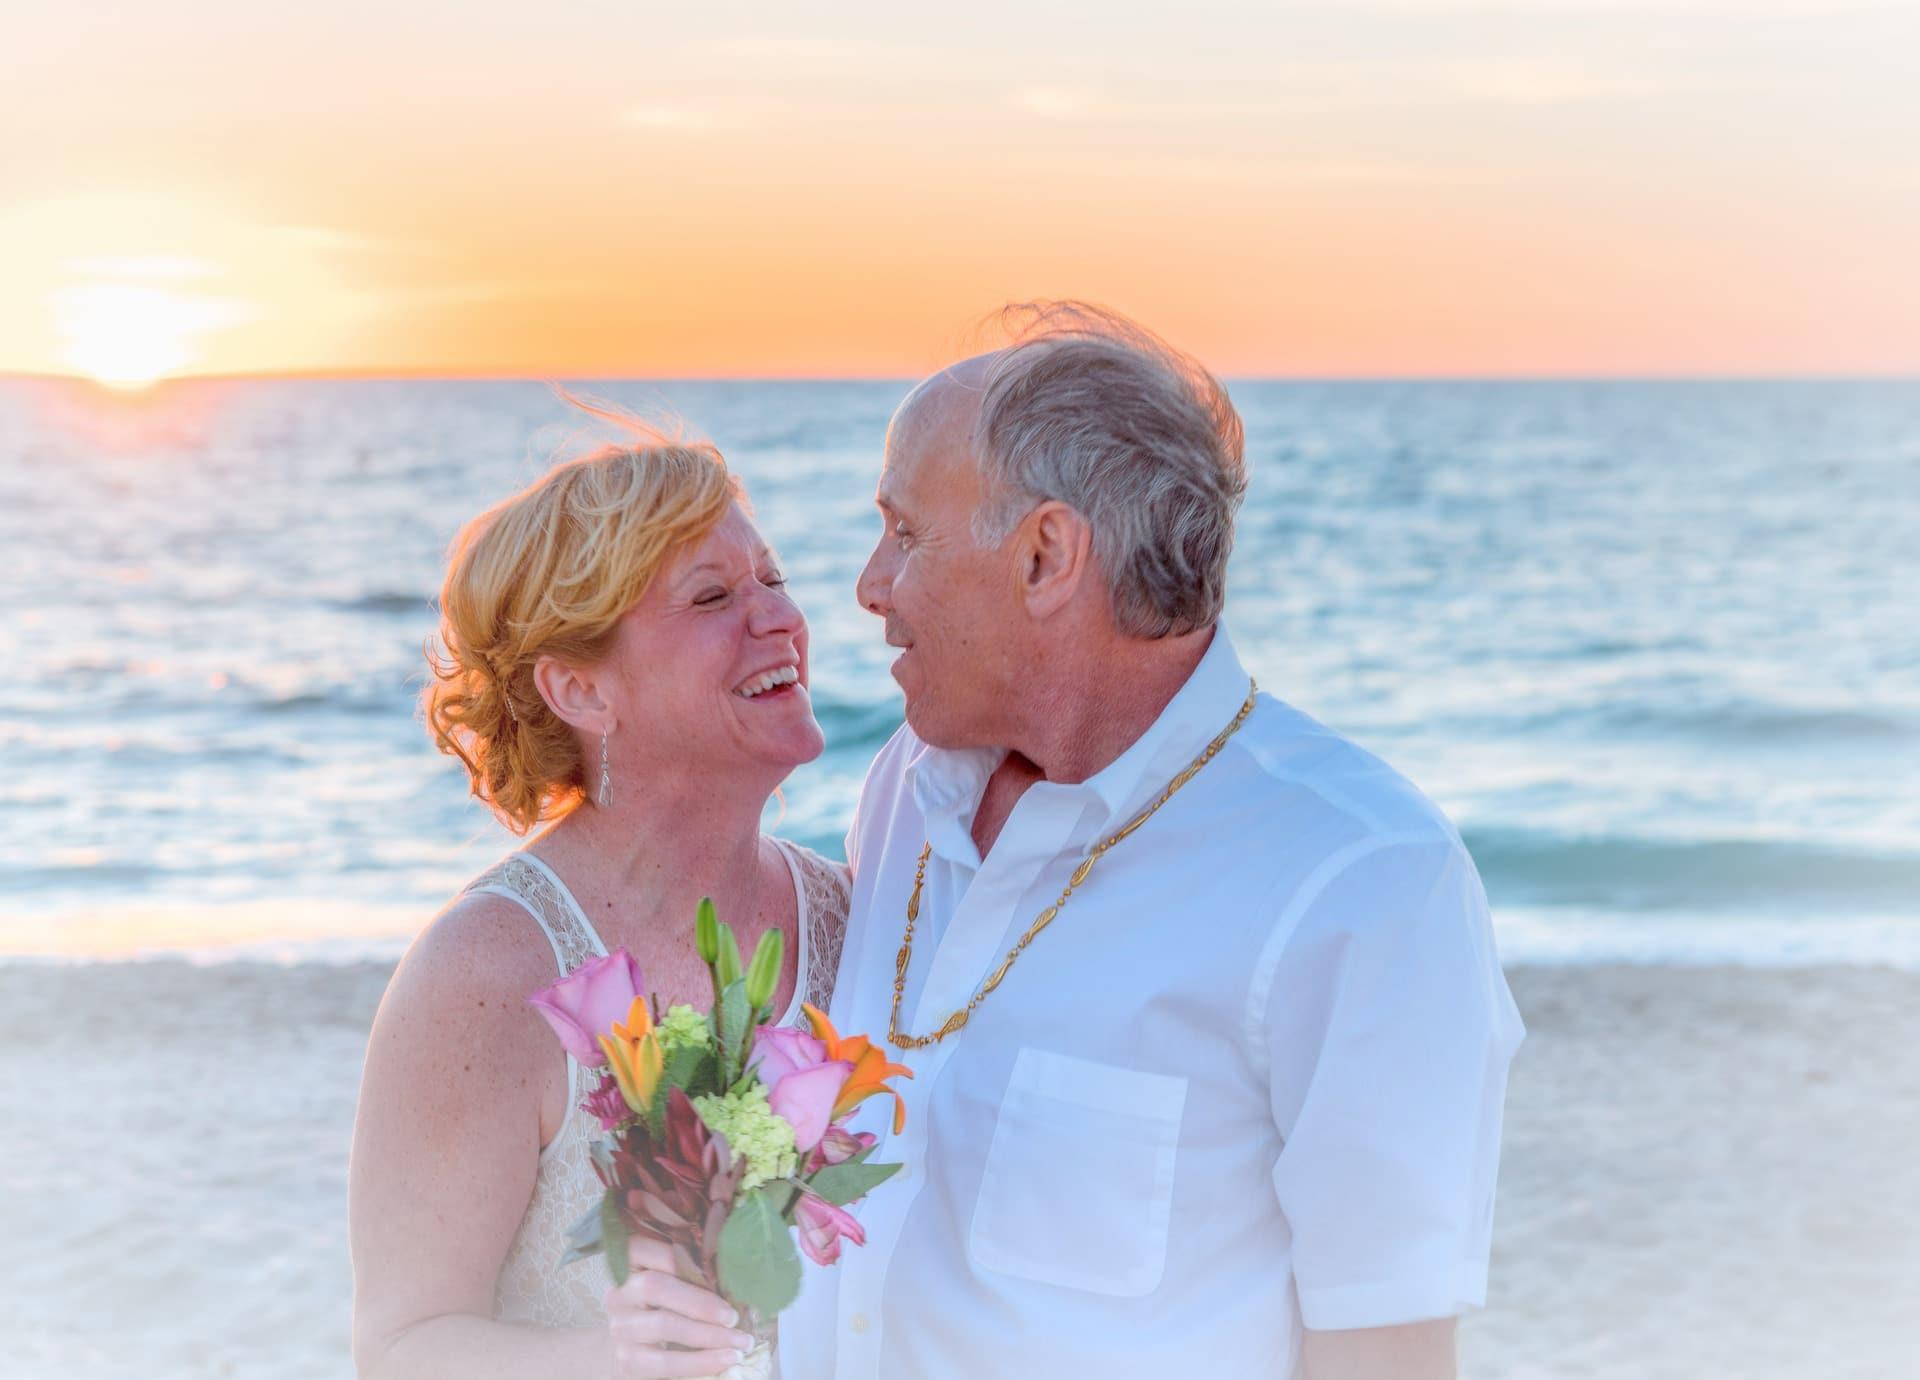 married but looking in dubasari